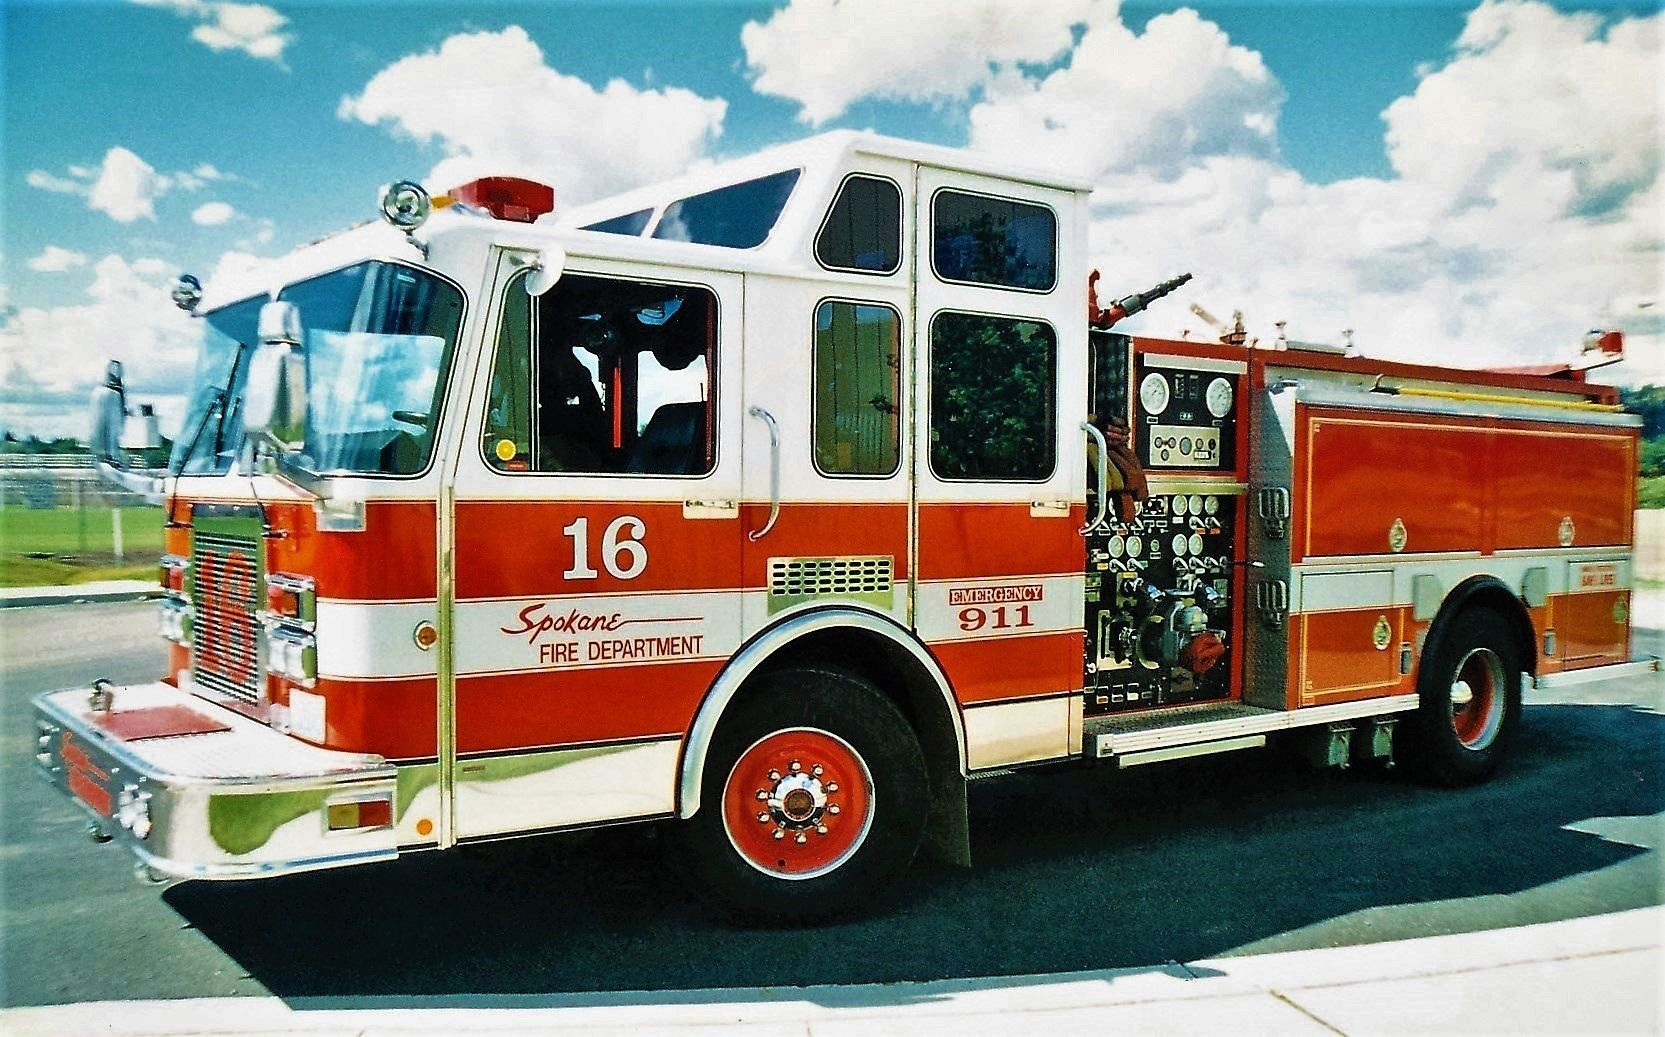 medium resolution of spokane fire department engine 16 1991 spartan central states 1500 500